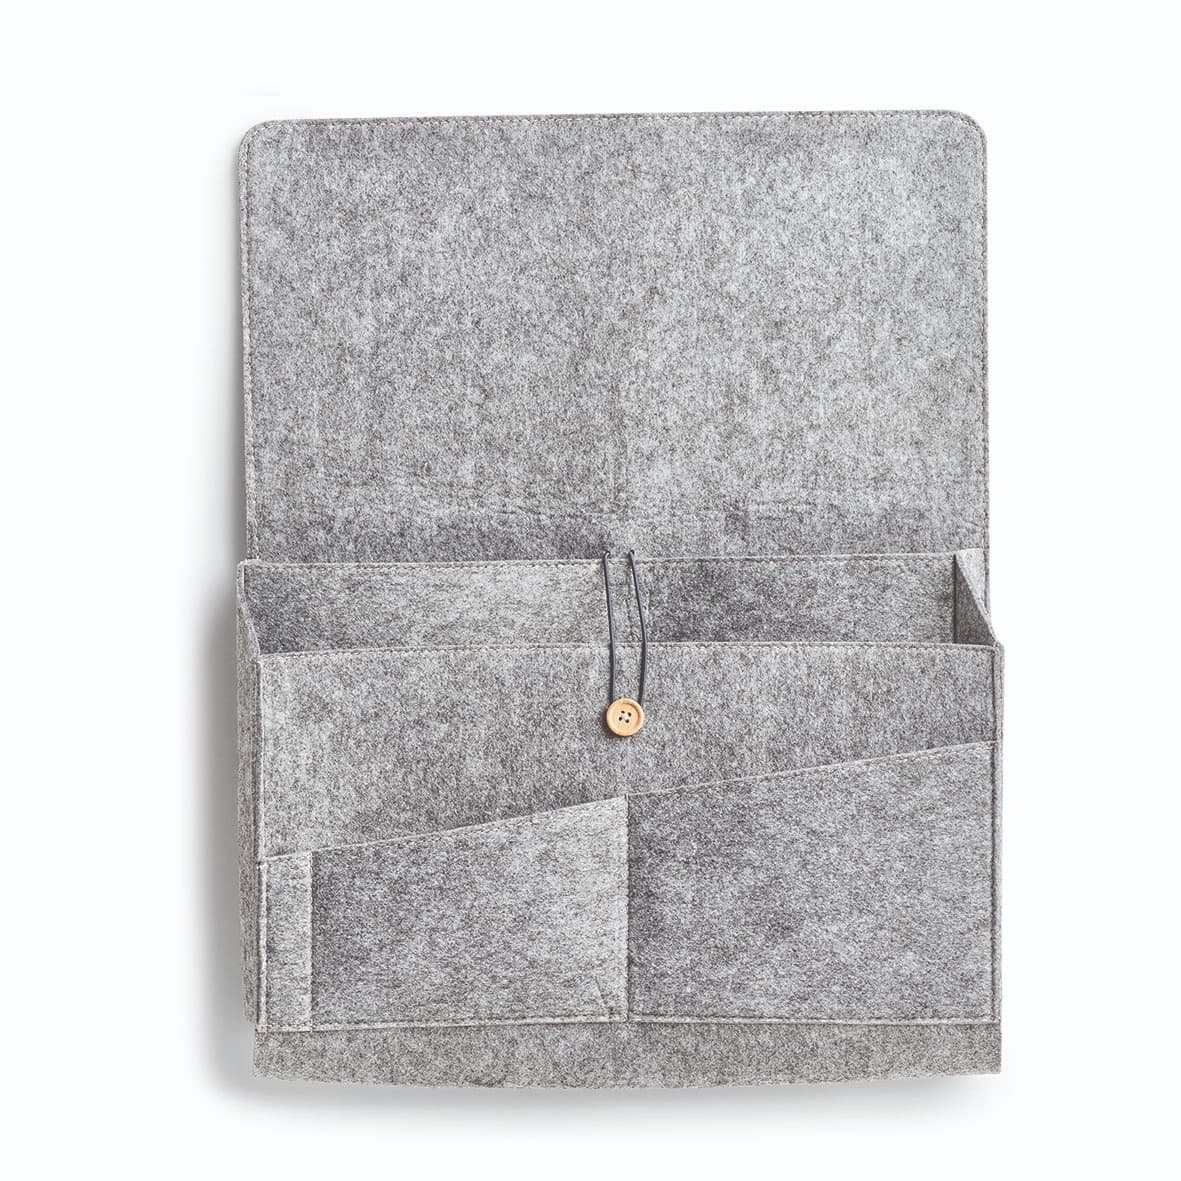 Organizator textil pentru birou, Couch Gri, l40xA7xH30 cm imagine